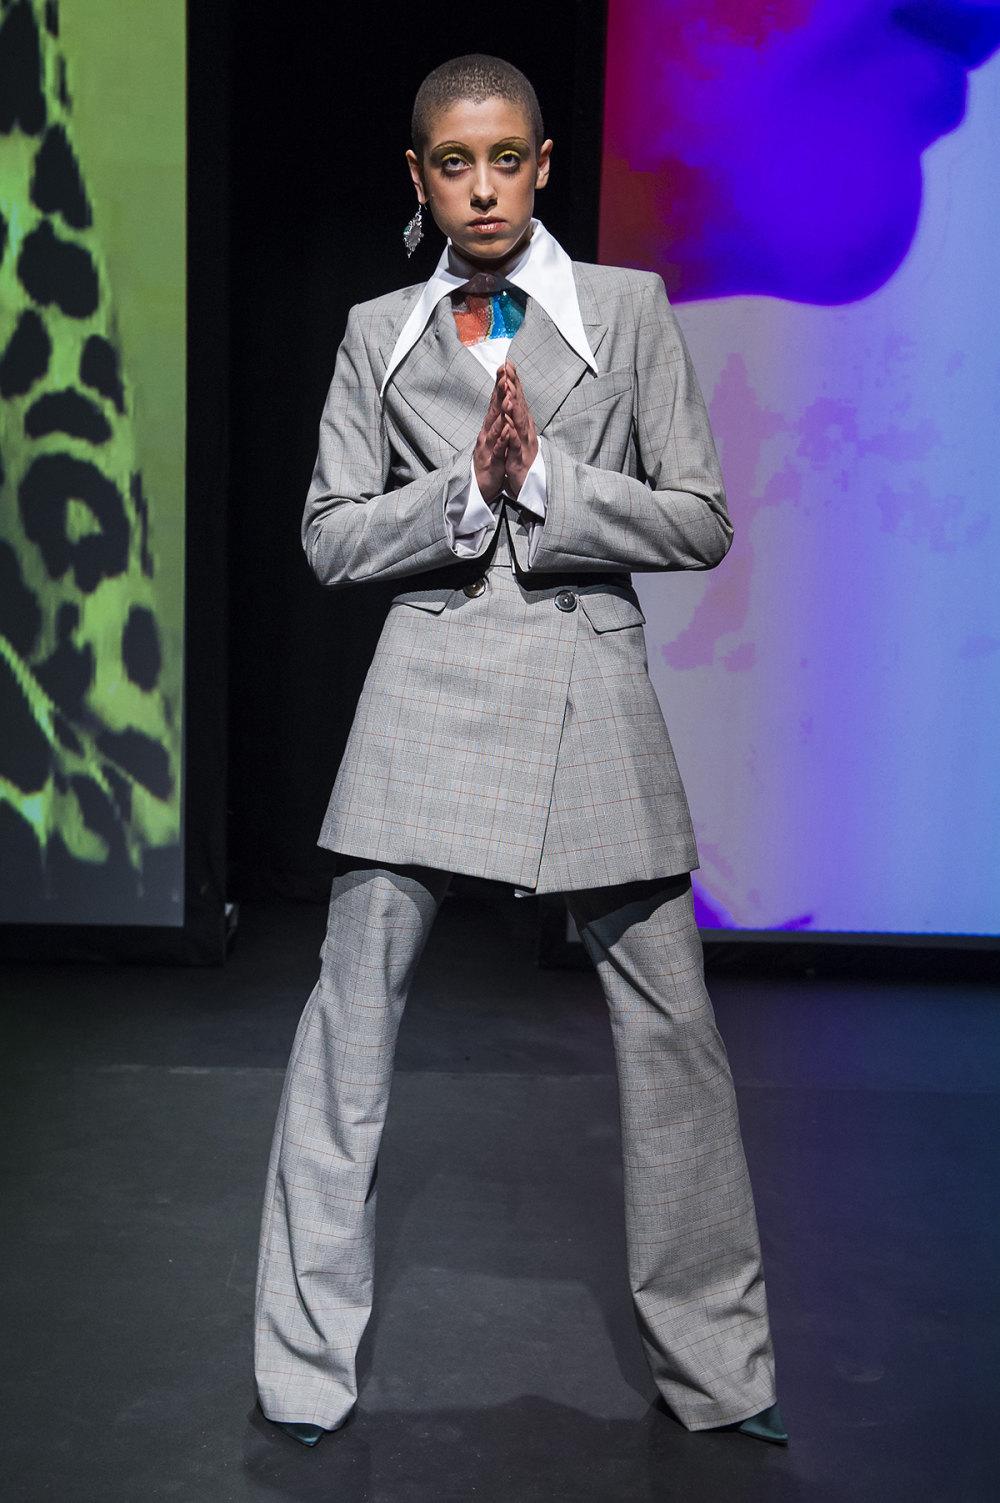 16Arlington时装系列标志性的時尚单色西装外还有更大胆的版本-6.jpg